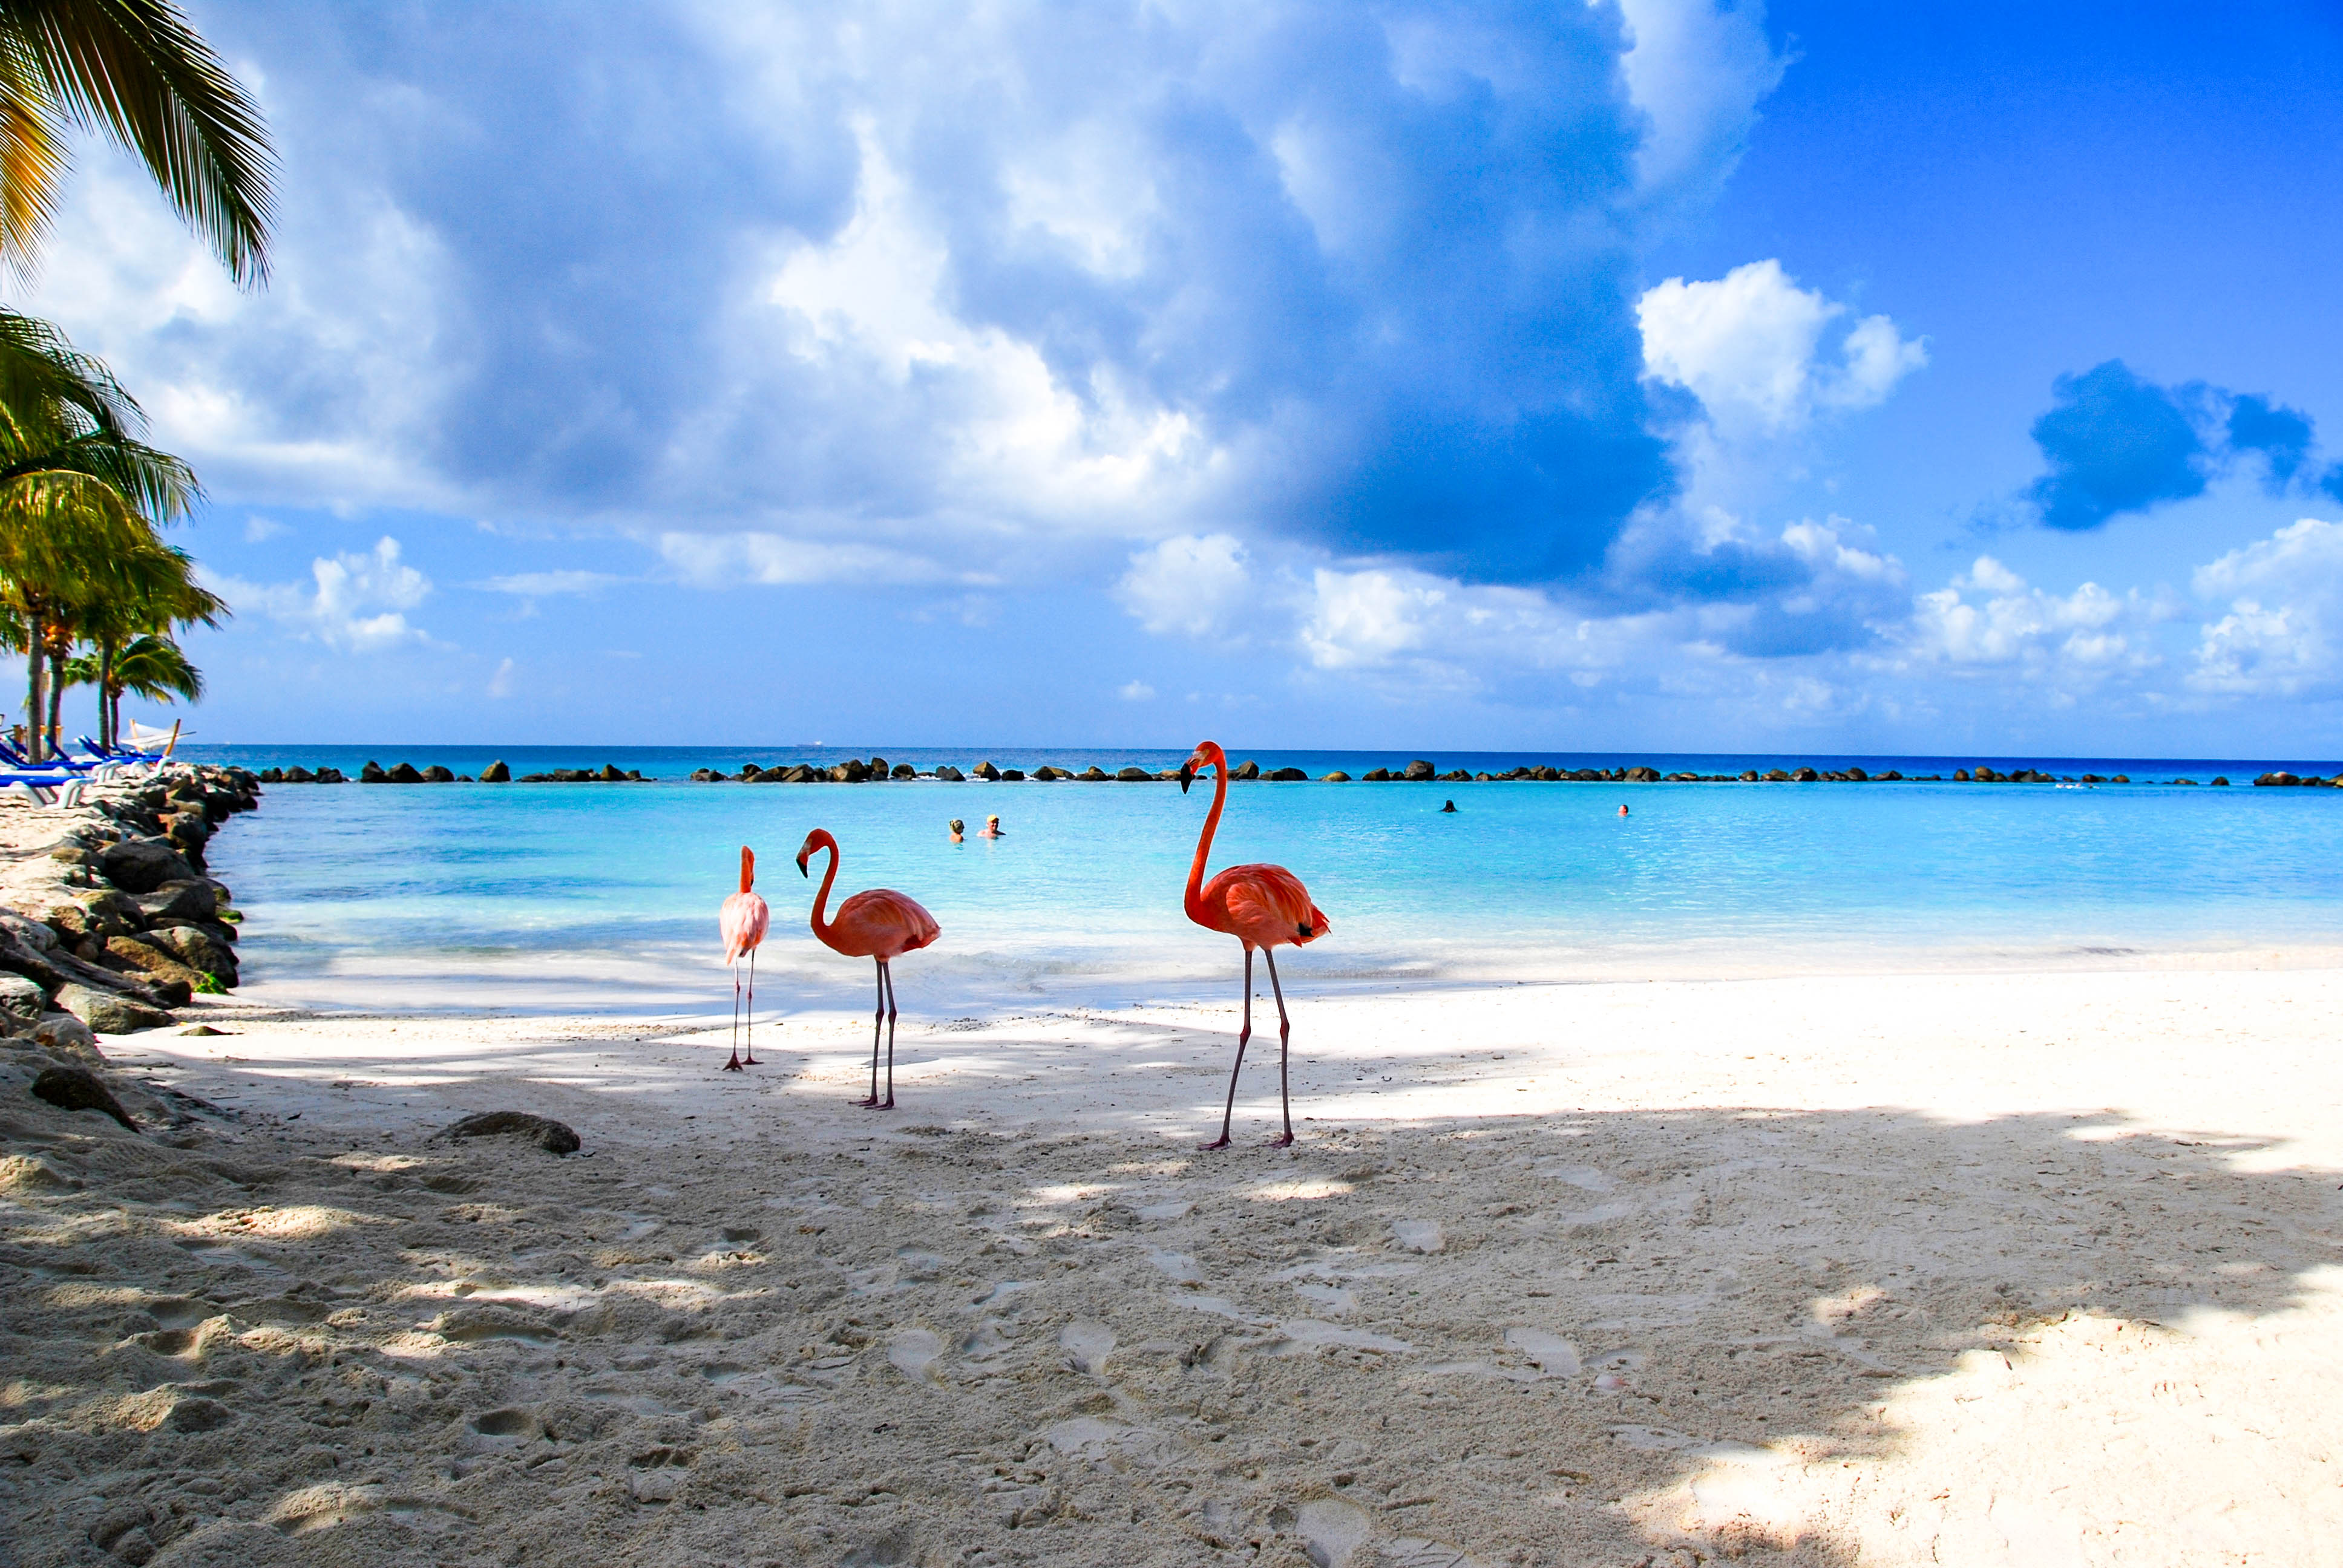 Flamingos am Strand von Aruba